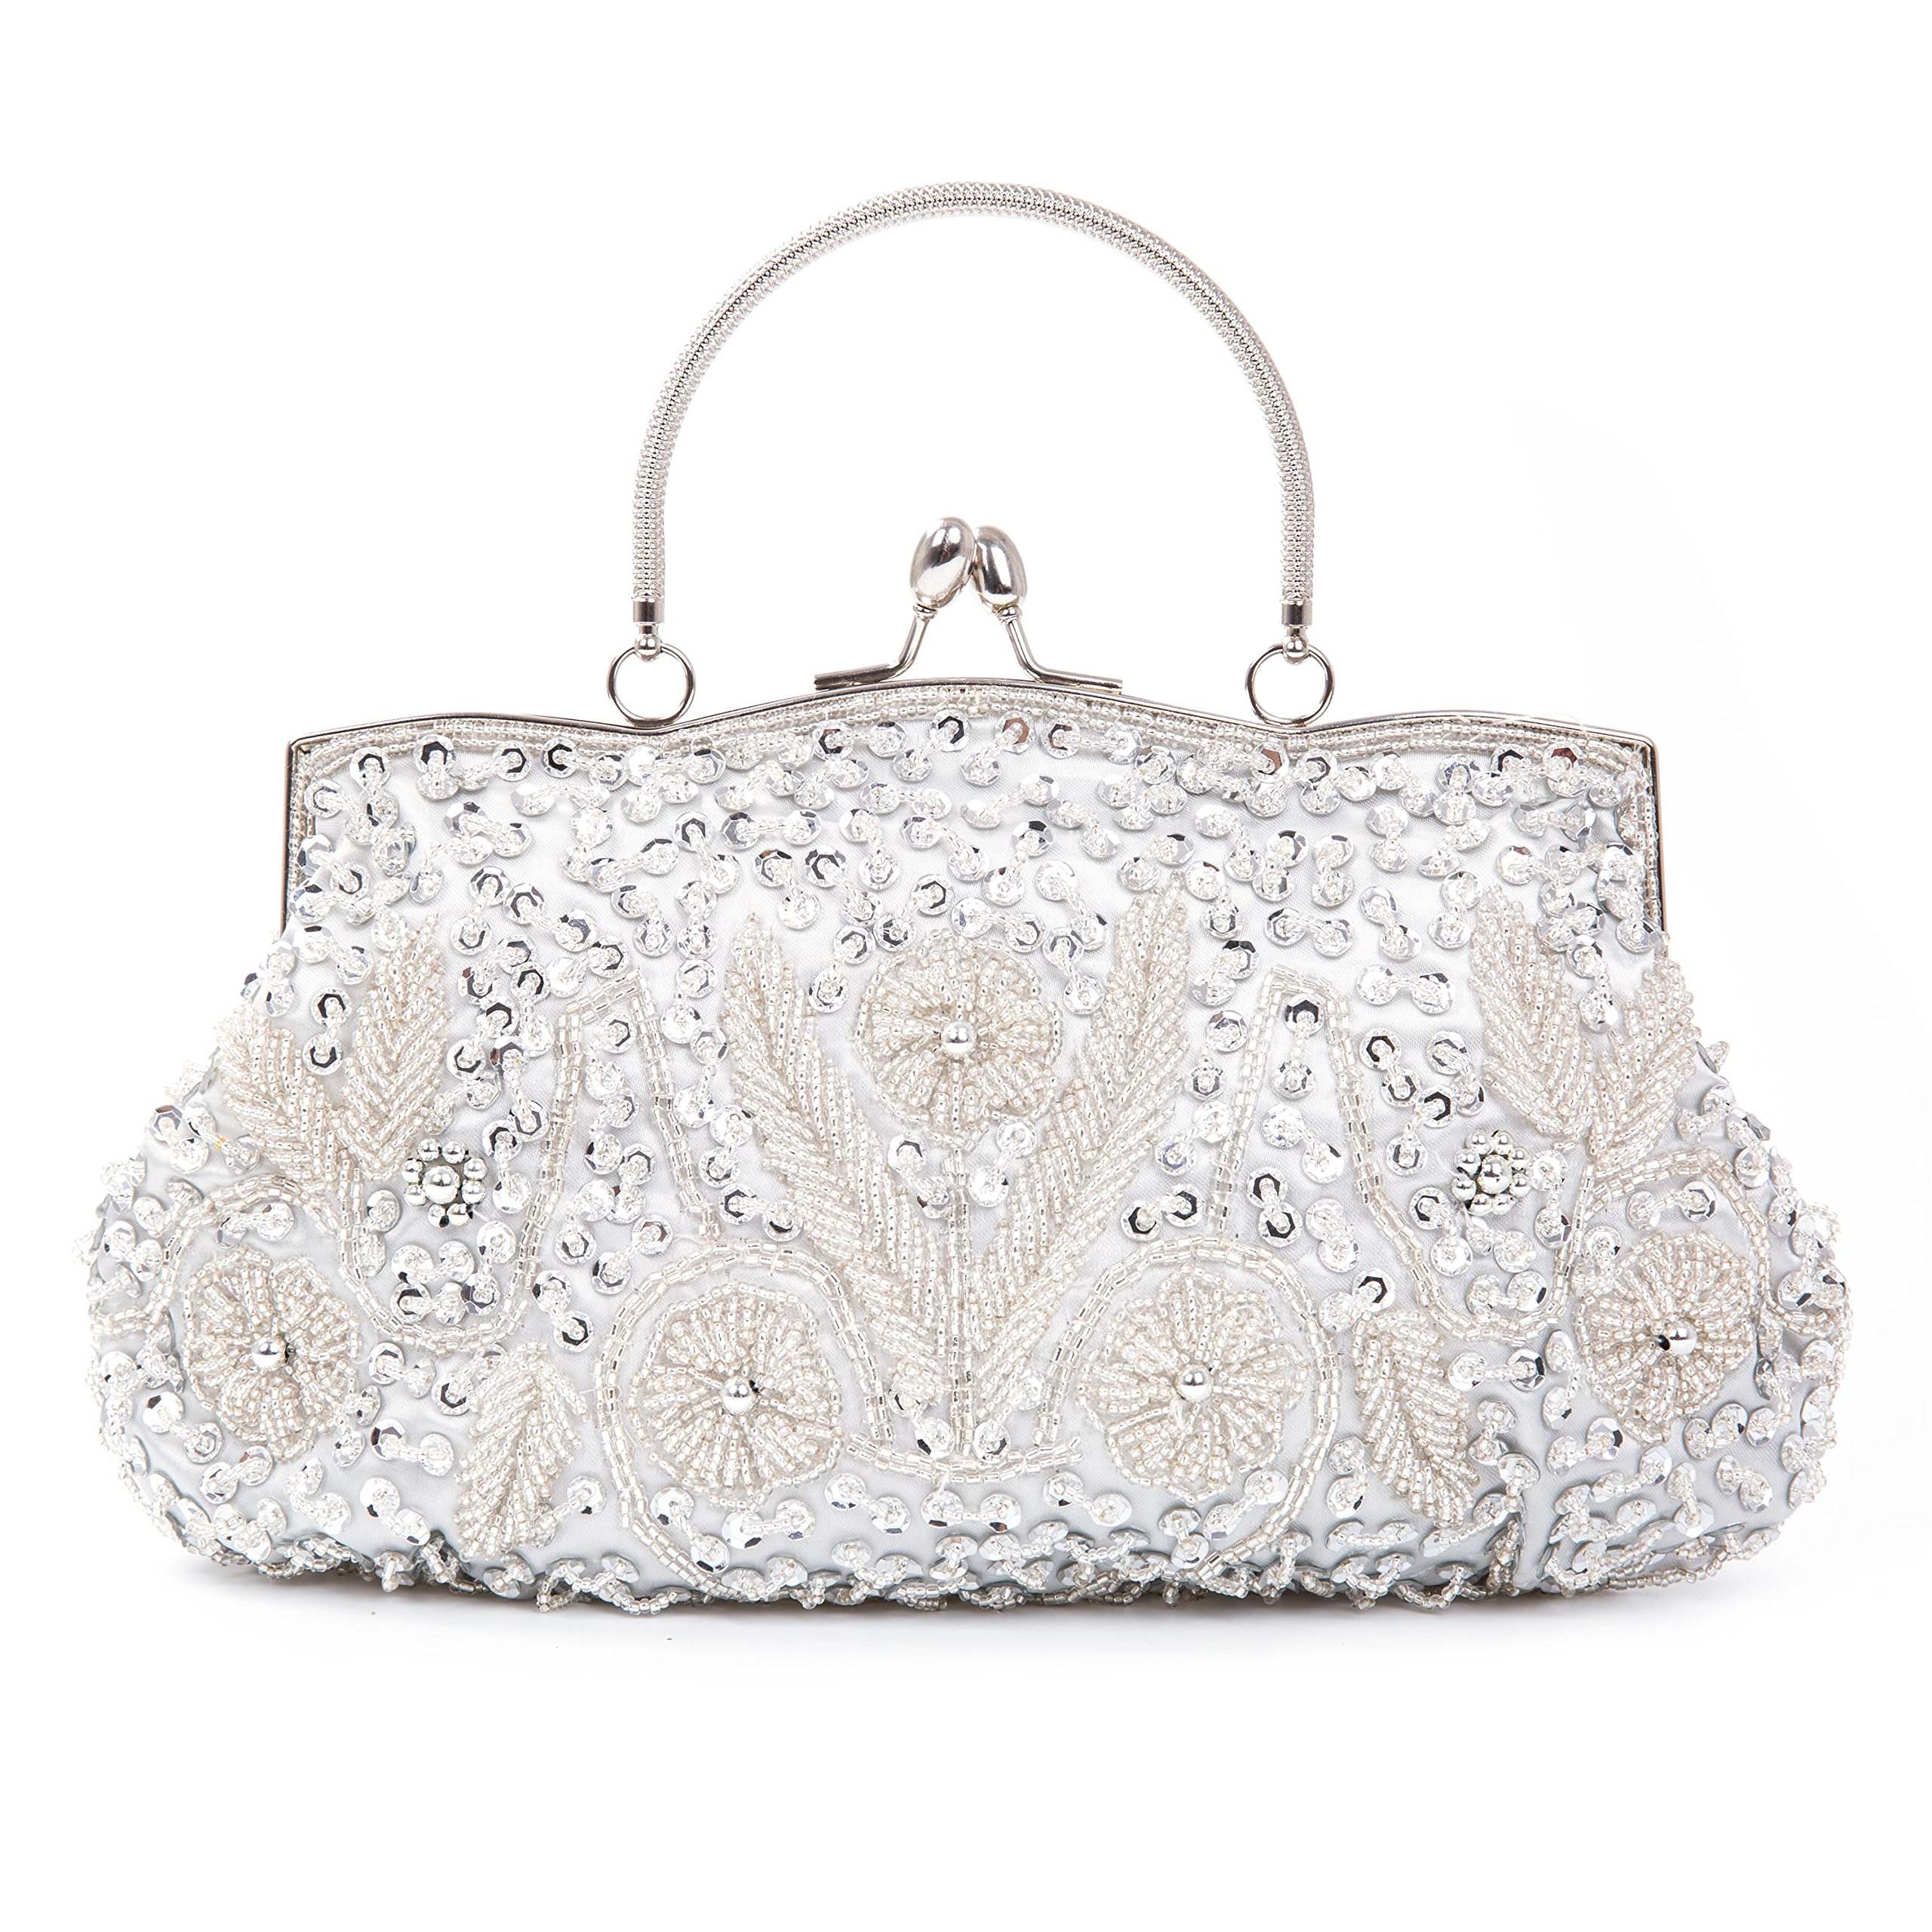 Chichitop Women's Vintage Kiss Lock Beaded Sequin Design Flower Evening Clutch Large Wedding Purse (Silver)